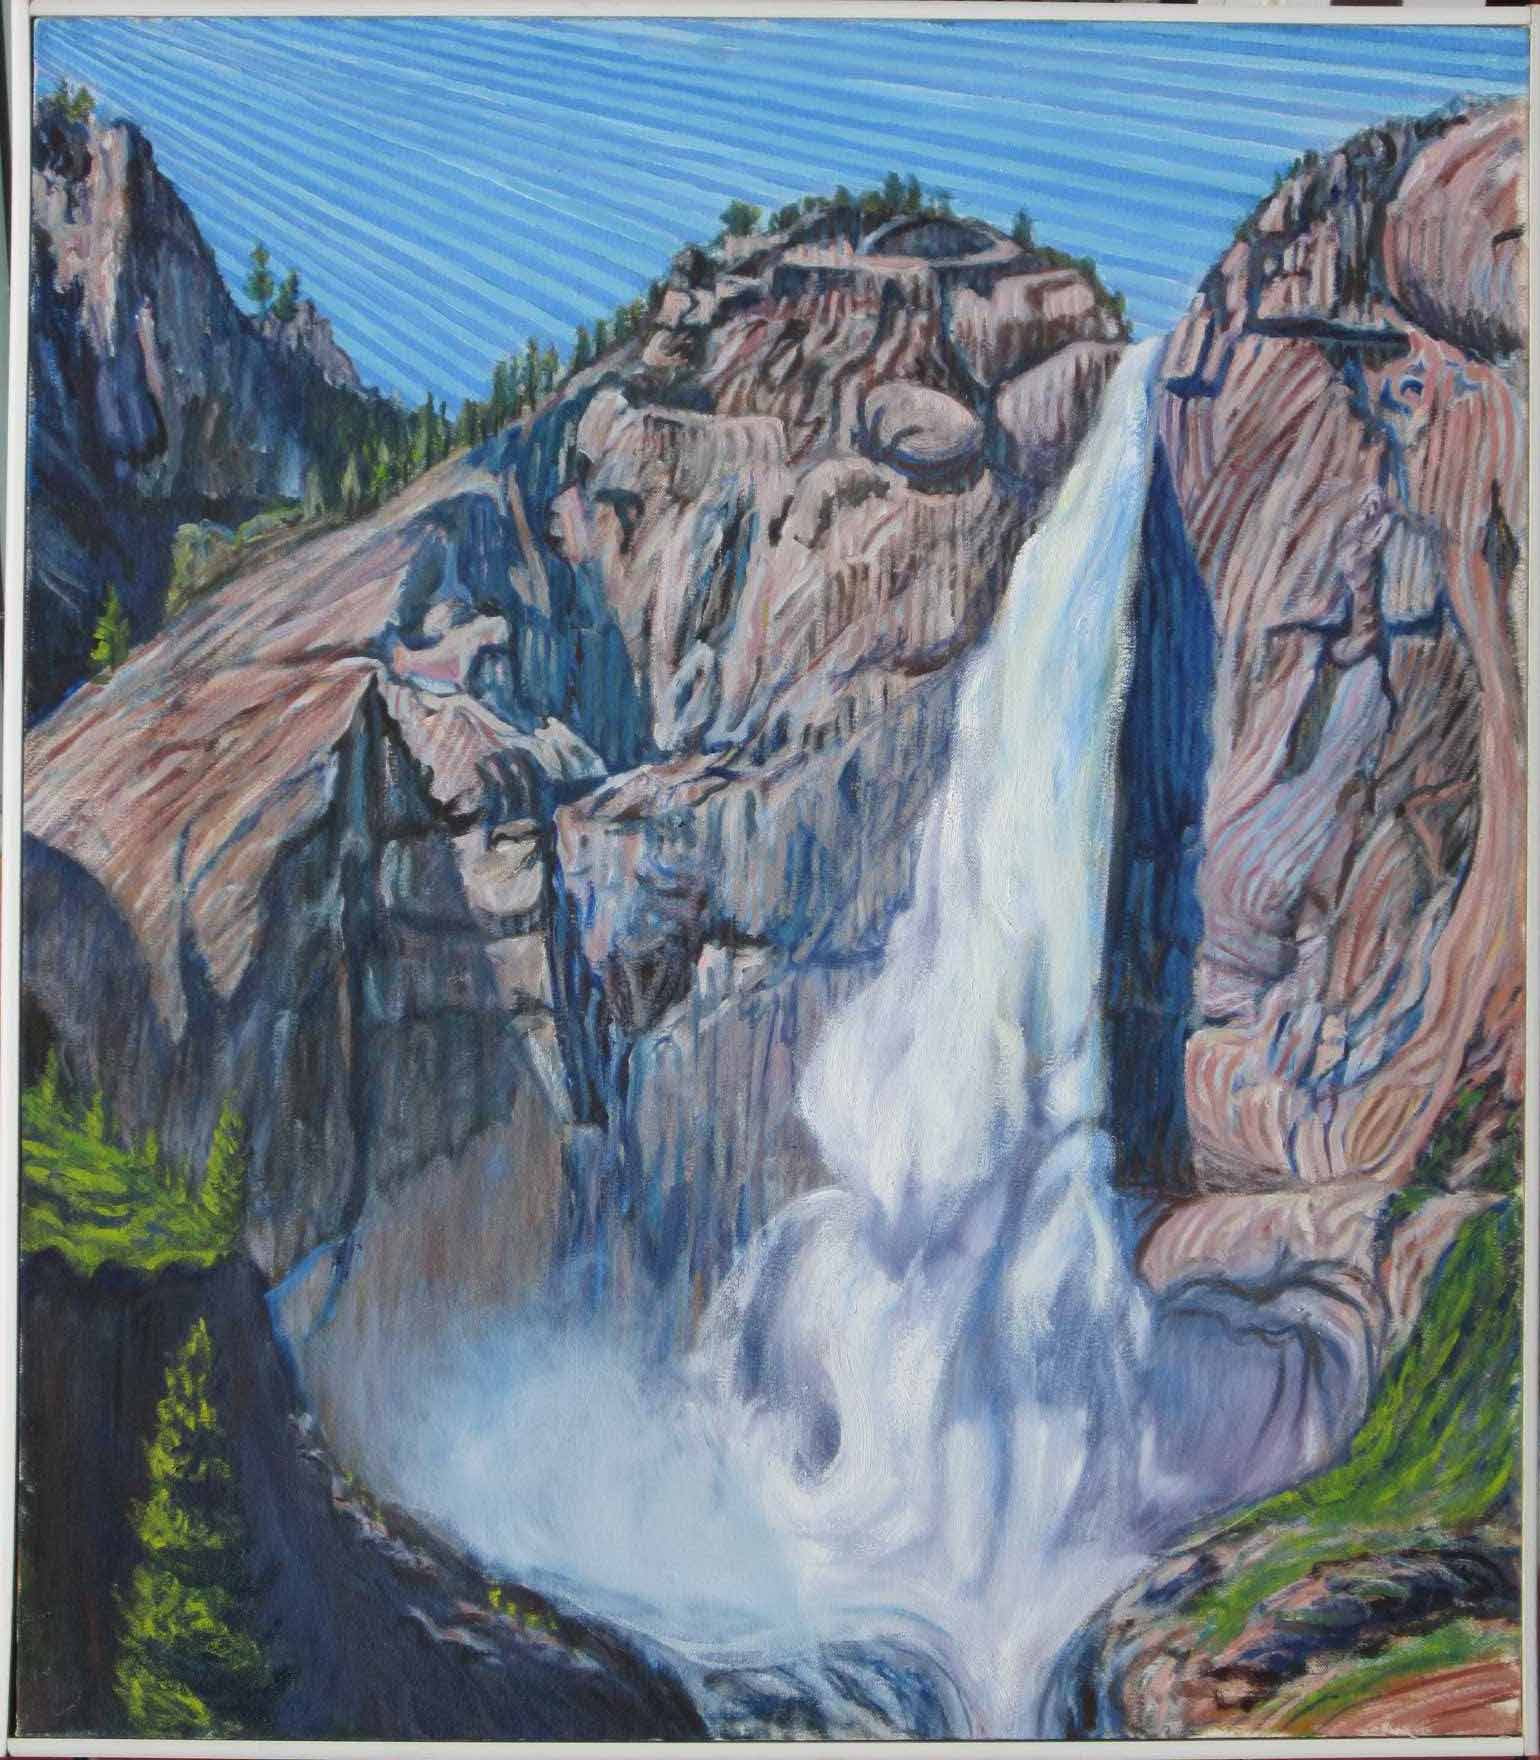 Upper Yosemite Falls - Linear Painting - Prakash N Chandras